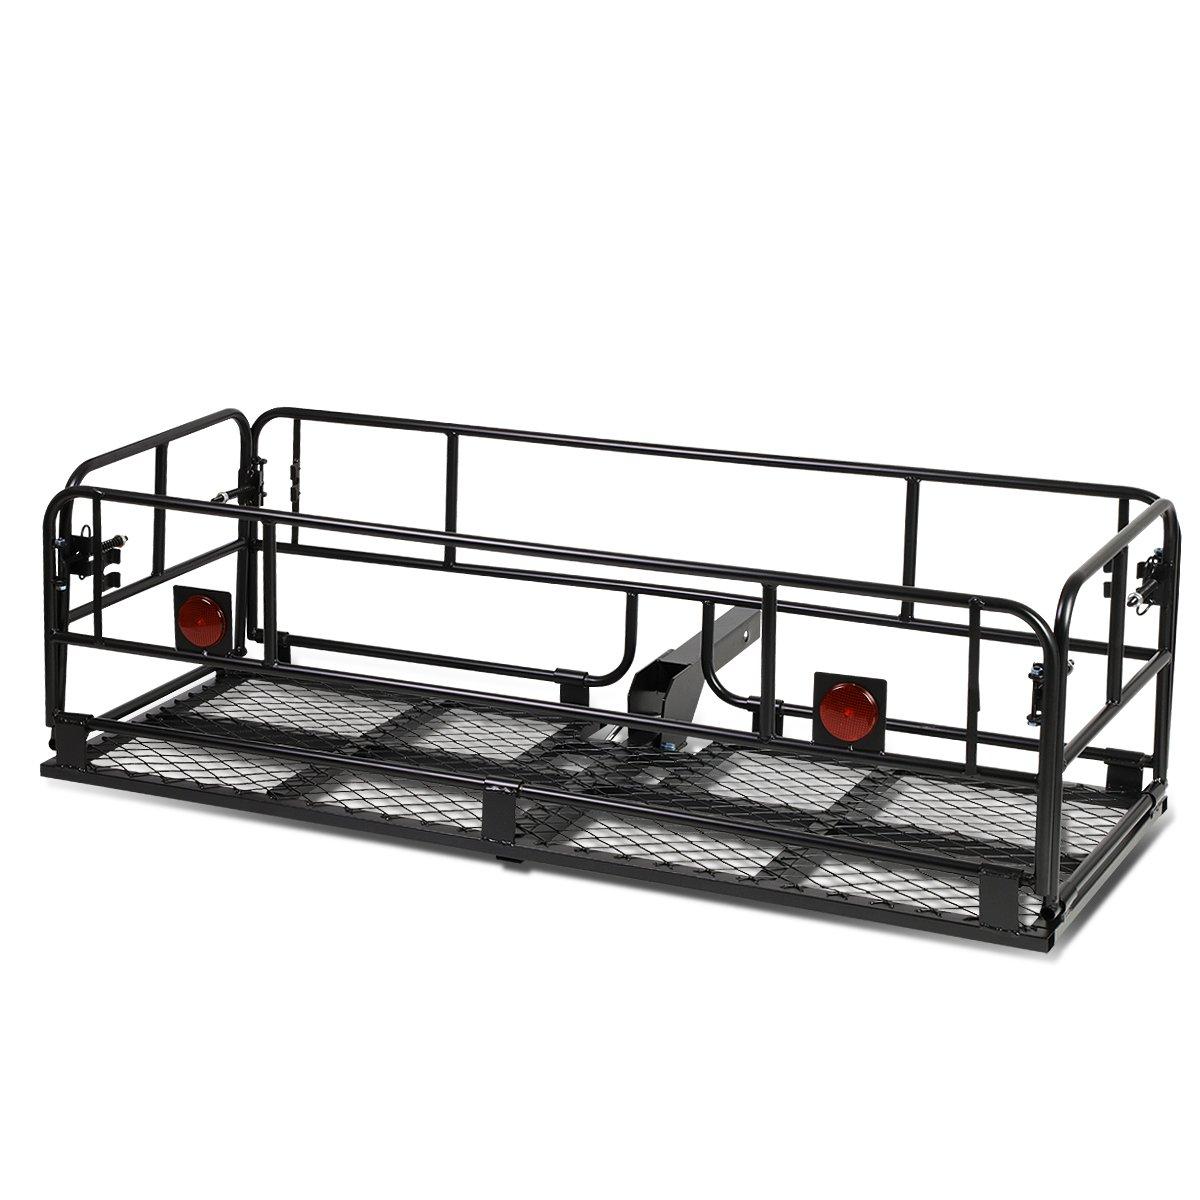 2' Hitch Fold-Up Cargo Basket Baggae/Luggage Box Carrier Rack (Powdered Coated Black) Auto Dynasty